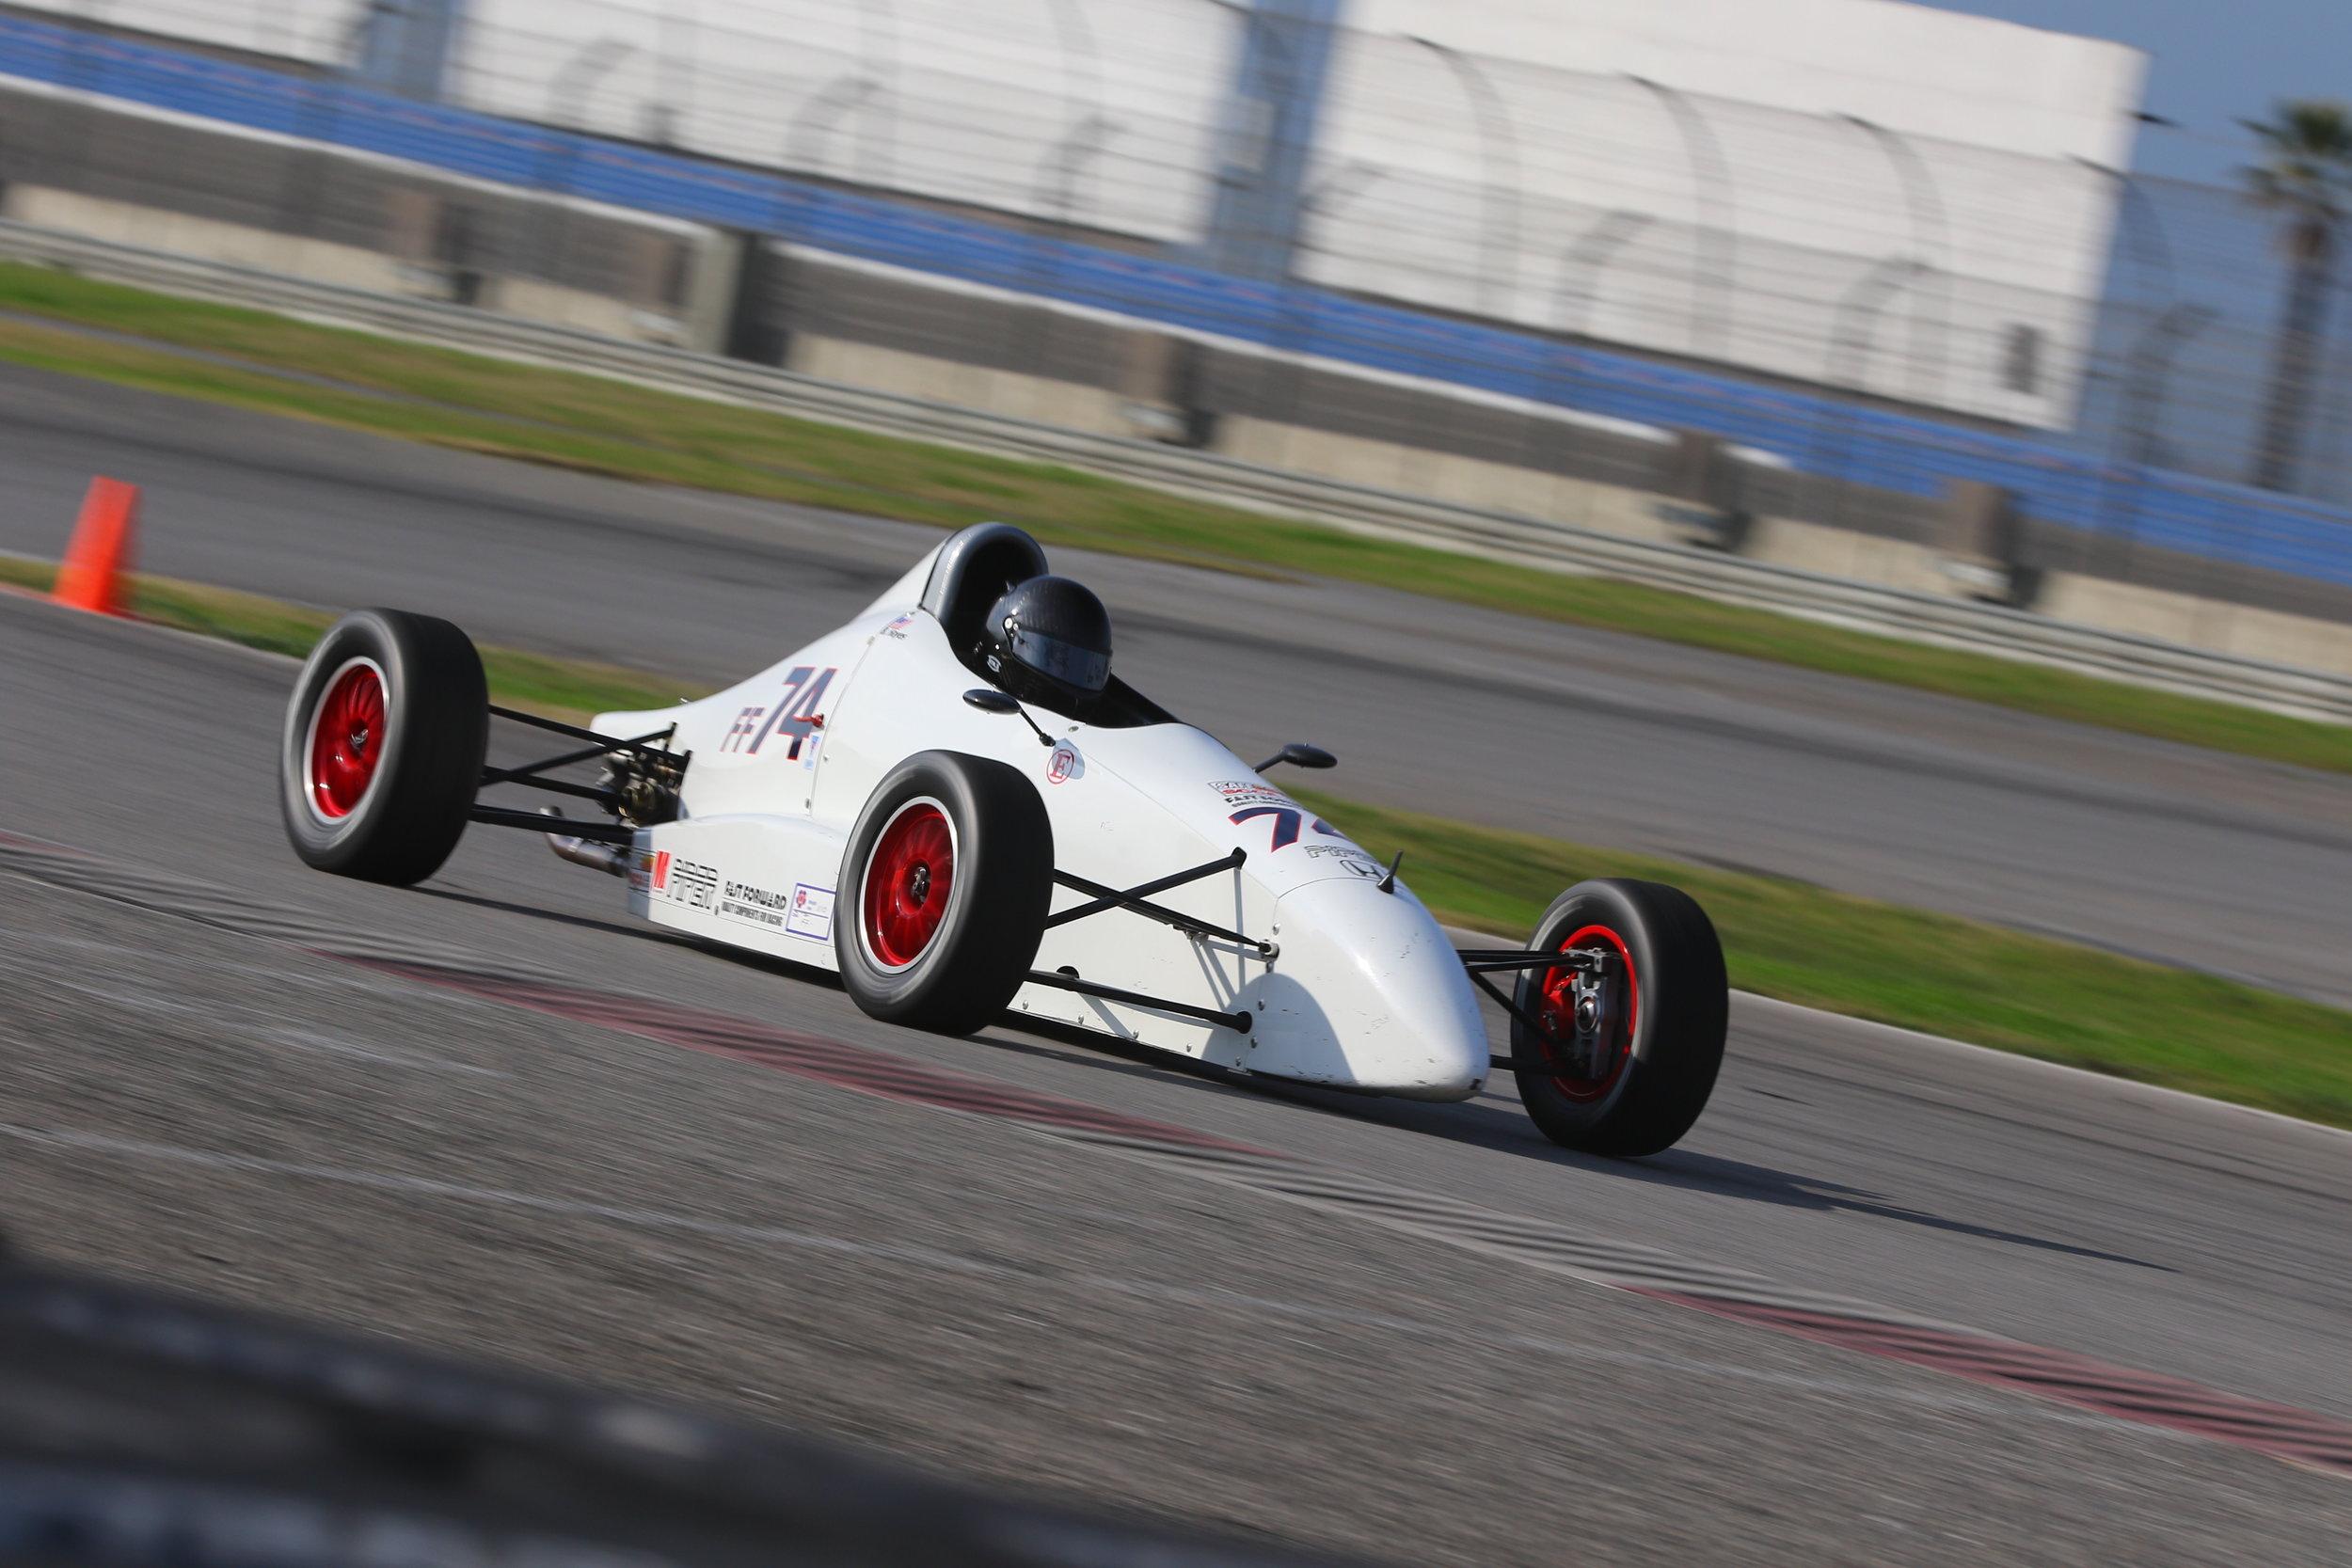 Jan-15-2017-SCCA Majors - Group 6 - Race (Turn 6) - AC2_7378_Jan1517_CaliPhoto.jpg